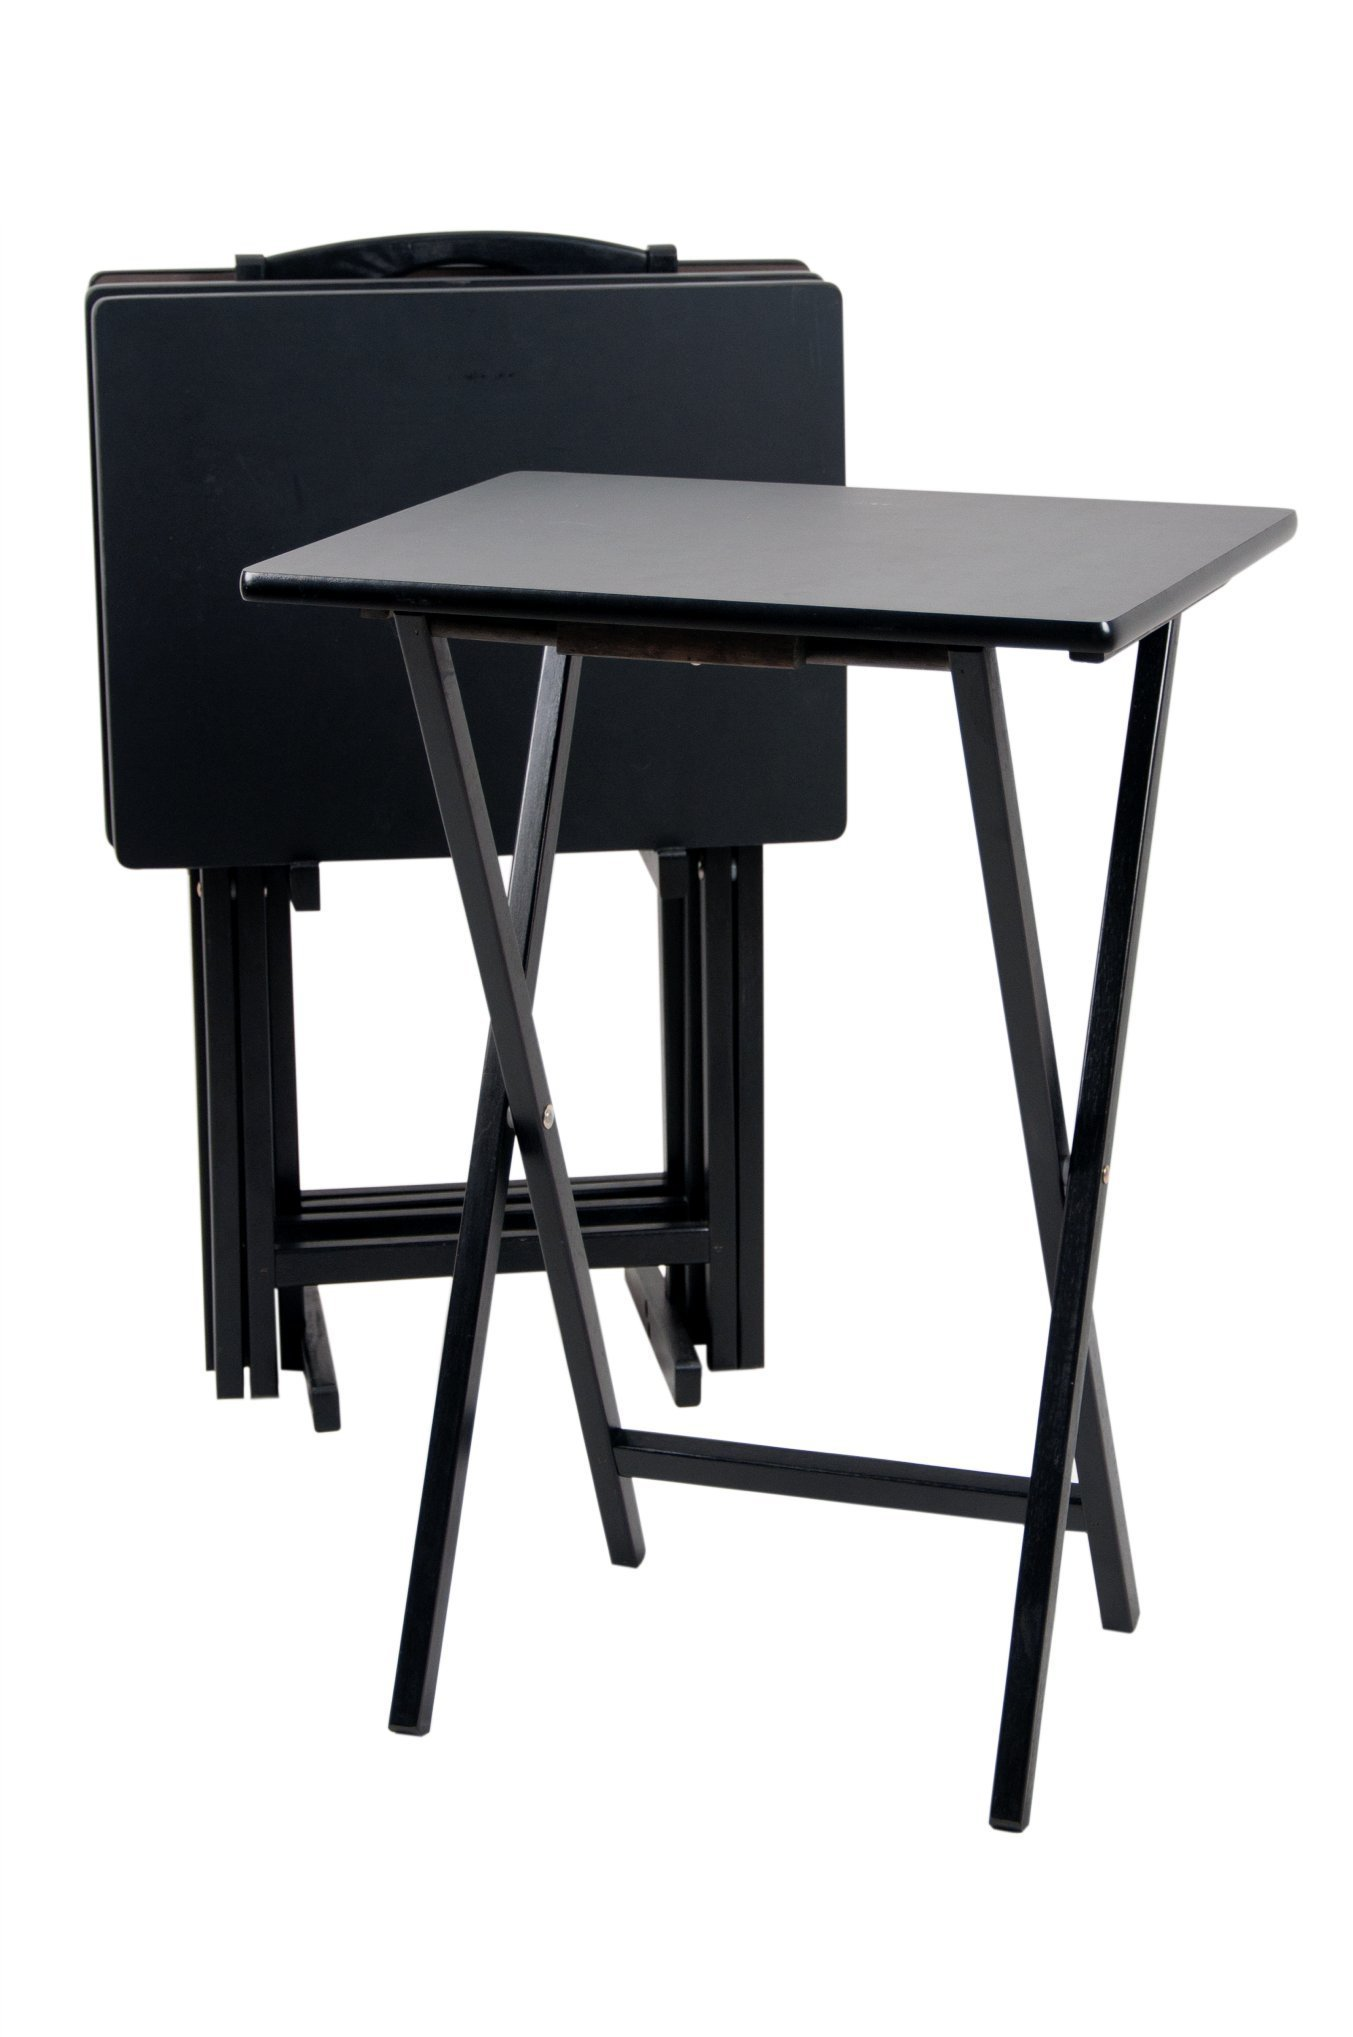 TV Tray 5 PC in Black Color